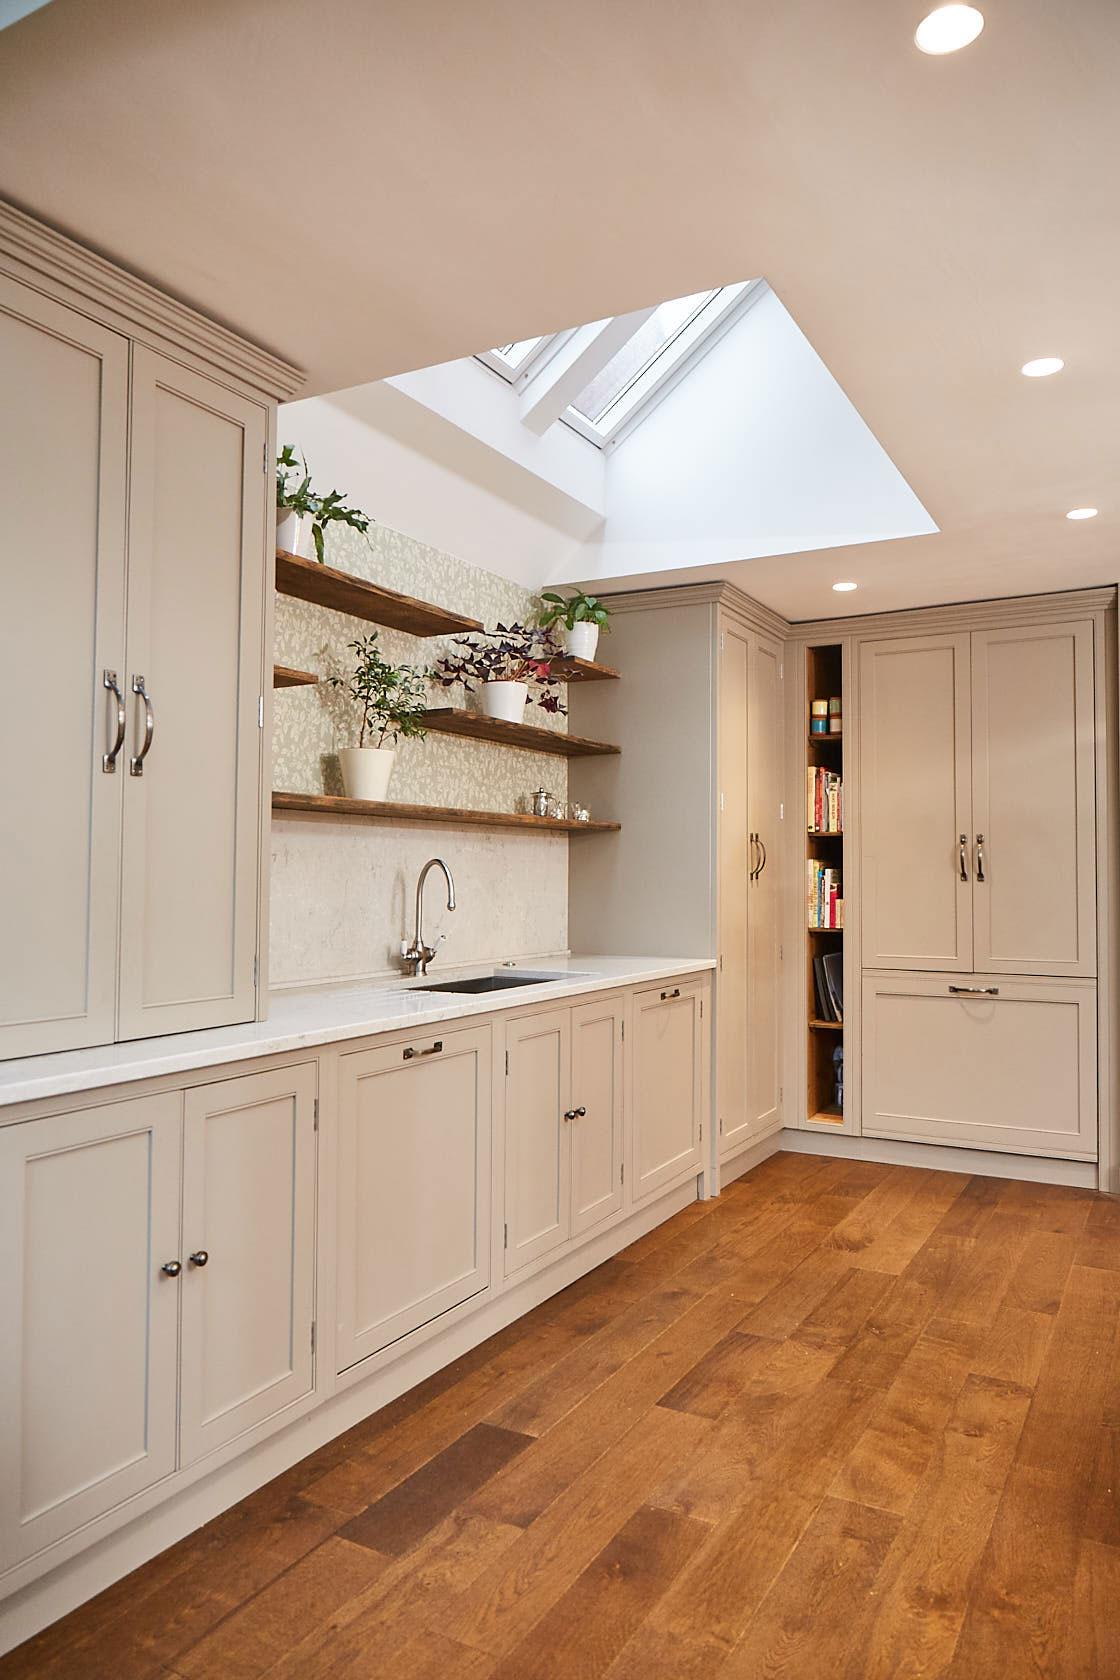 Reclaimed oak open shelves with plants above kitchen sink run